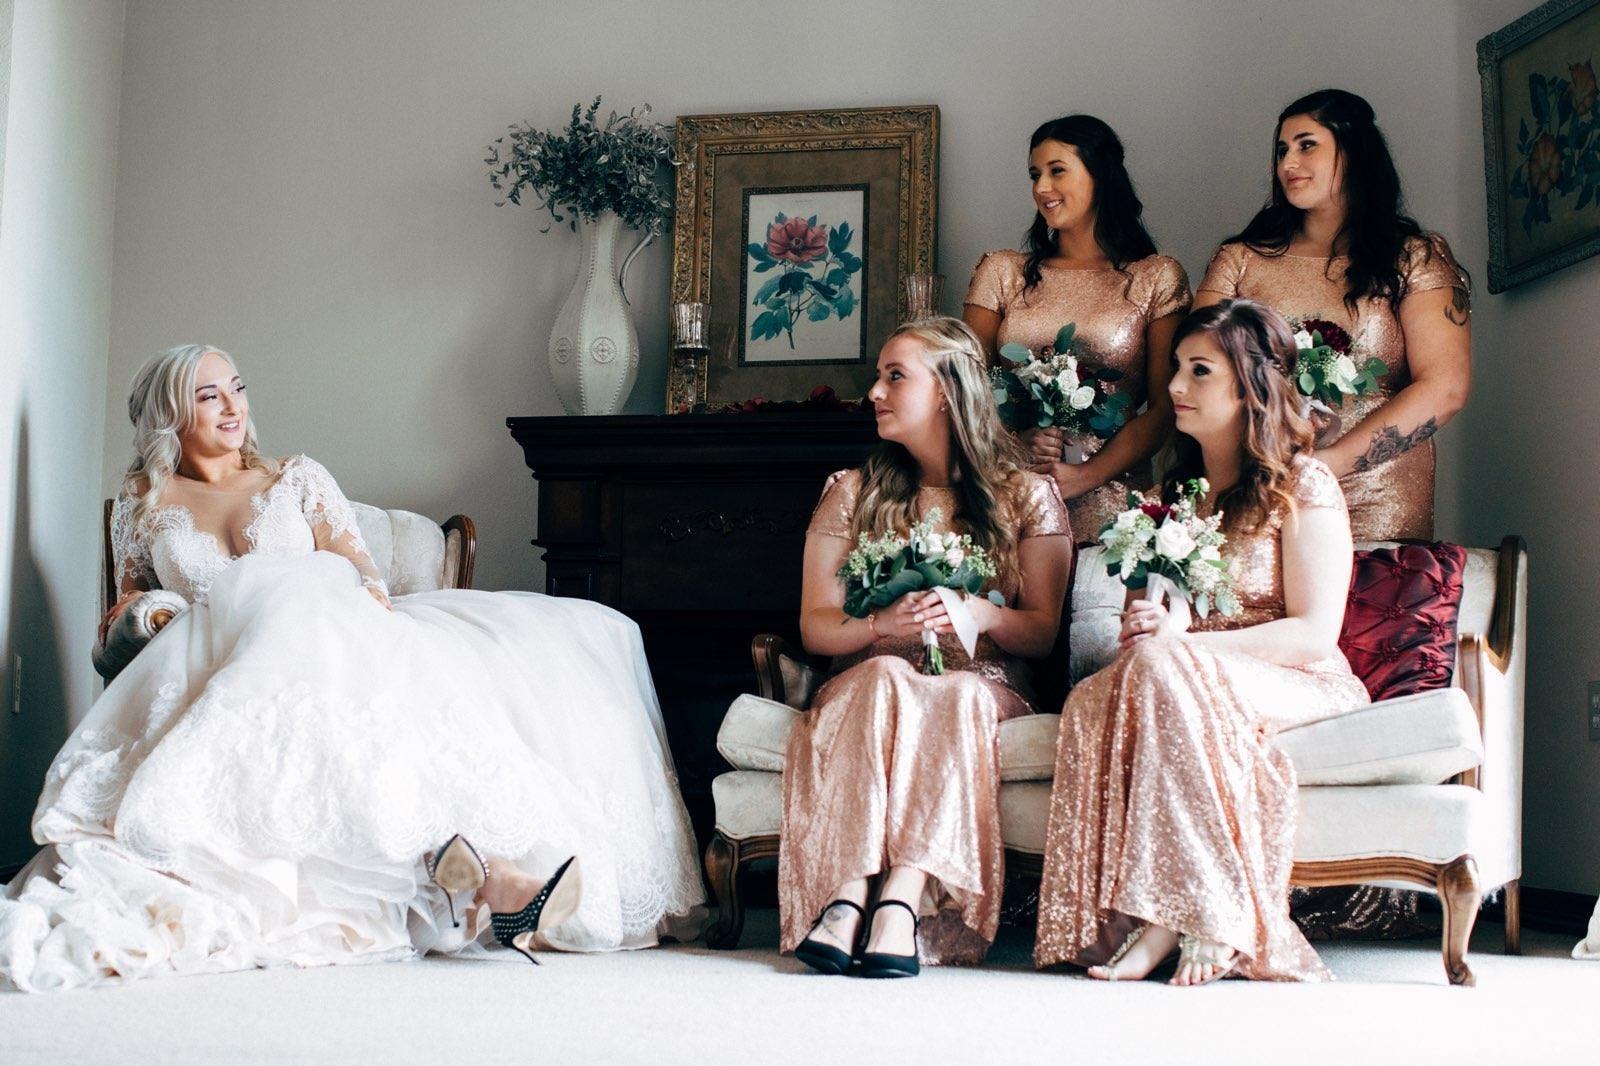 Bride and bridesmaids | Photo: Pexels